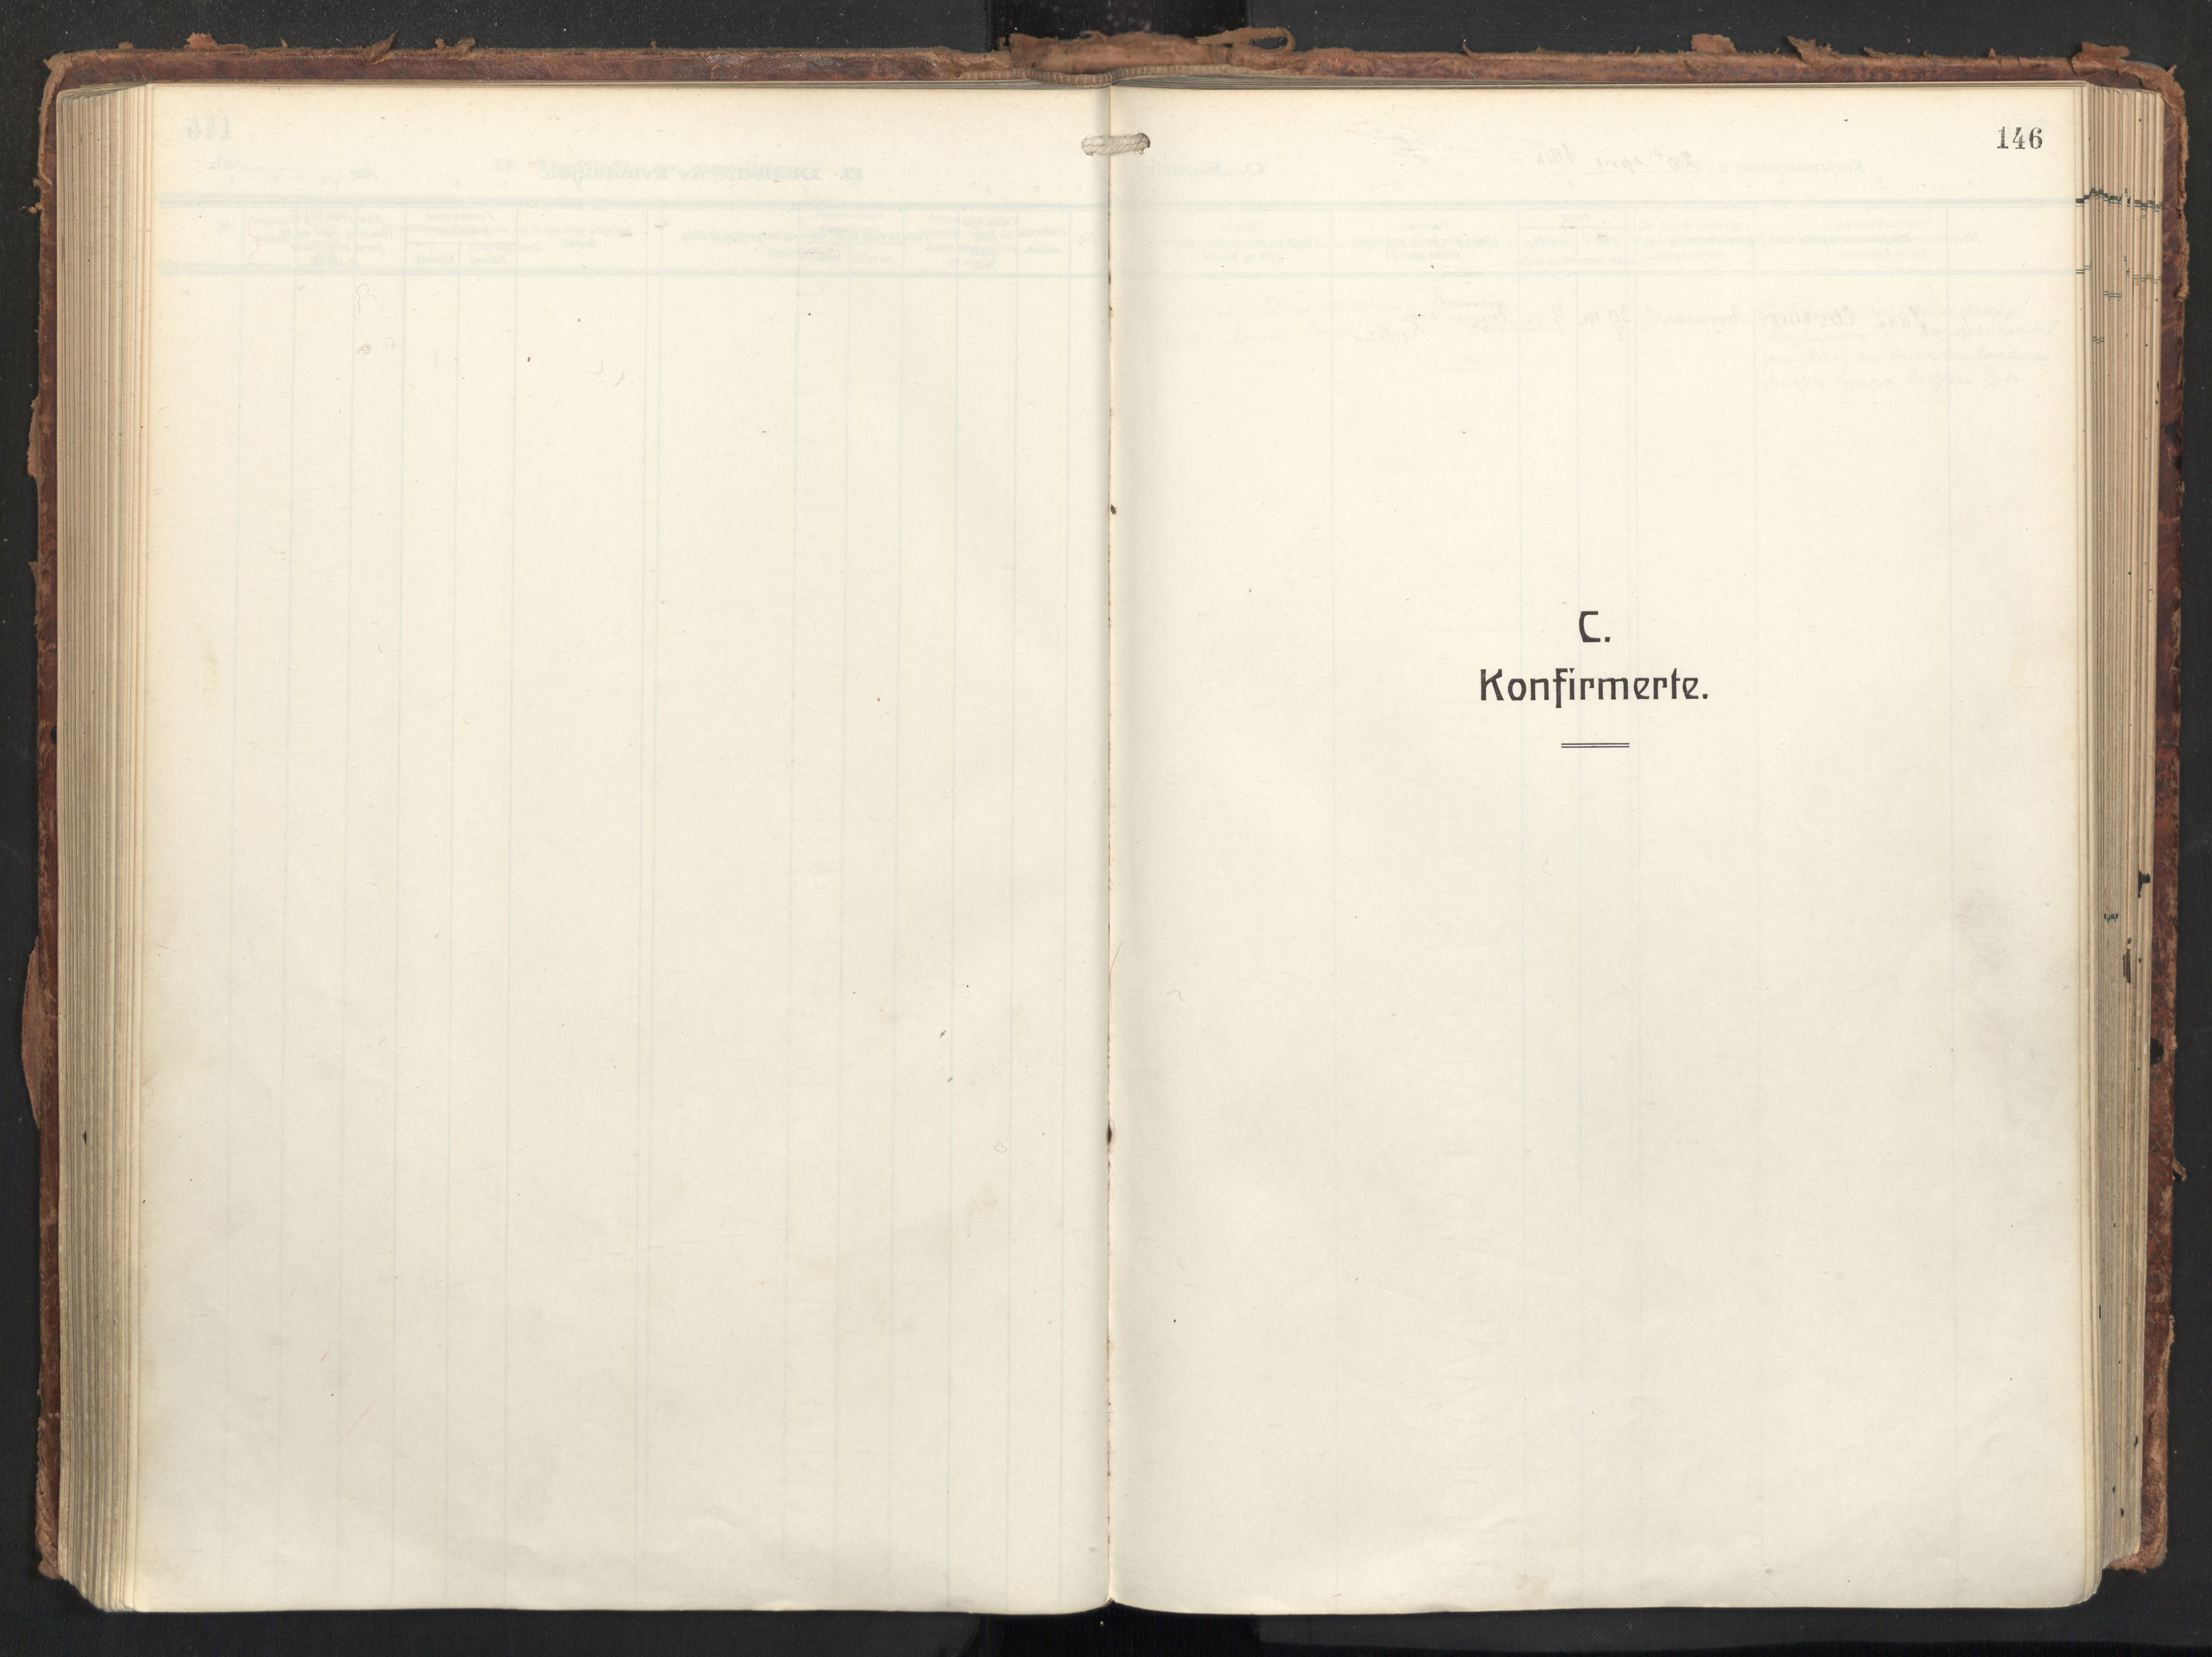 SAT, Ministerialprotokoller, klokkerbøker og fødselsregistre - Nordland, 874/L1064: Ministerialbok nr. 874A08, 1915-1926, s. 146